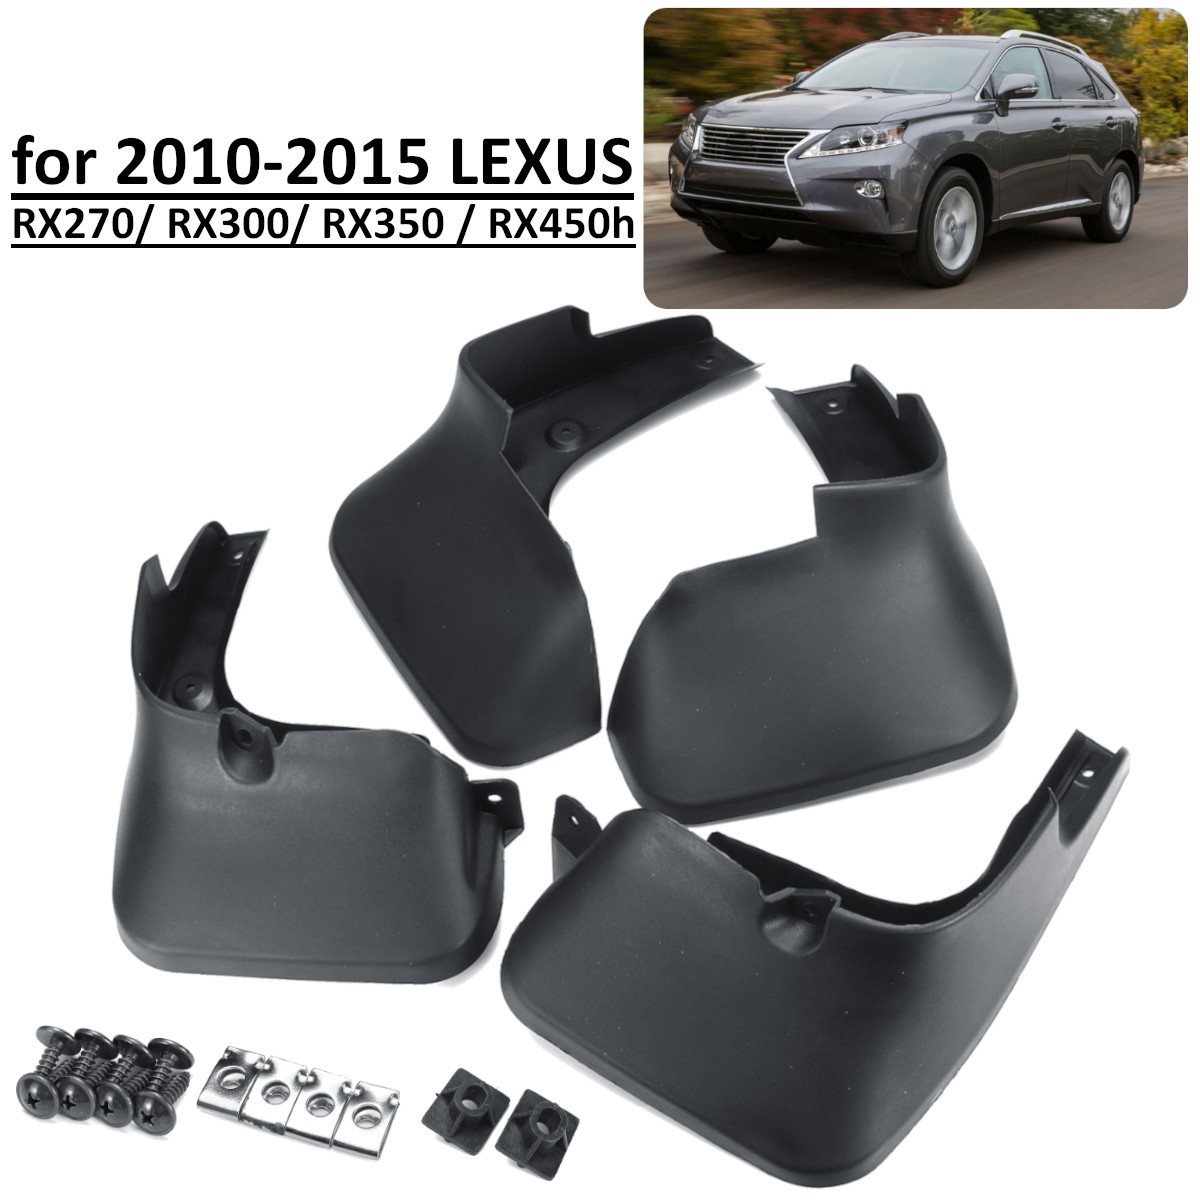 Araba çamur Flaps LEXUS RX RX270 RX300 RX350 RX450H 2010-2015 Splash muhafızları çamur Flaps çamurluklar aksesuarları